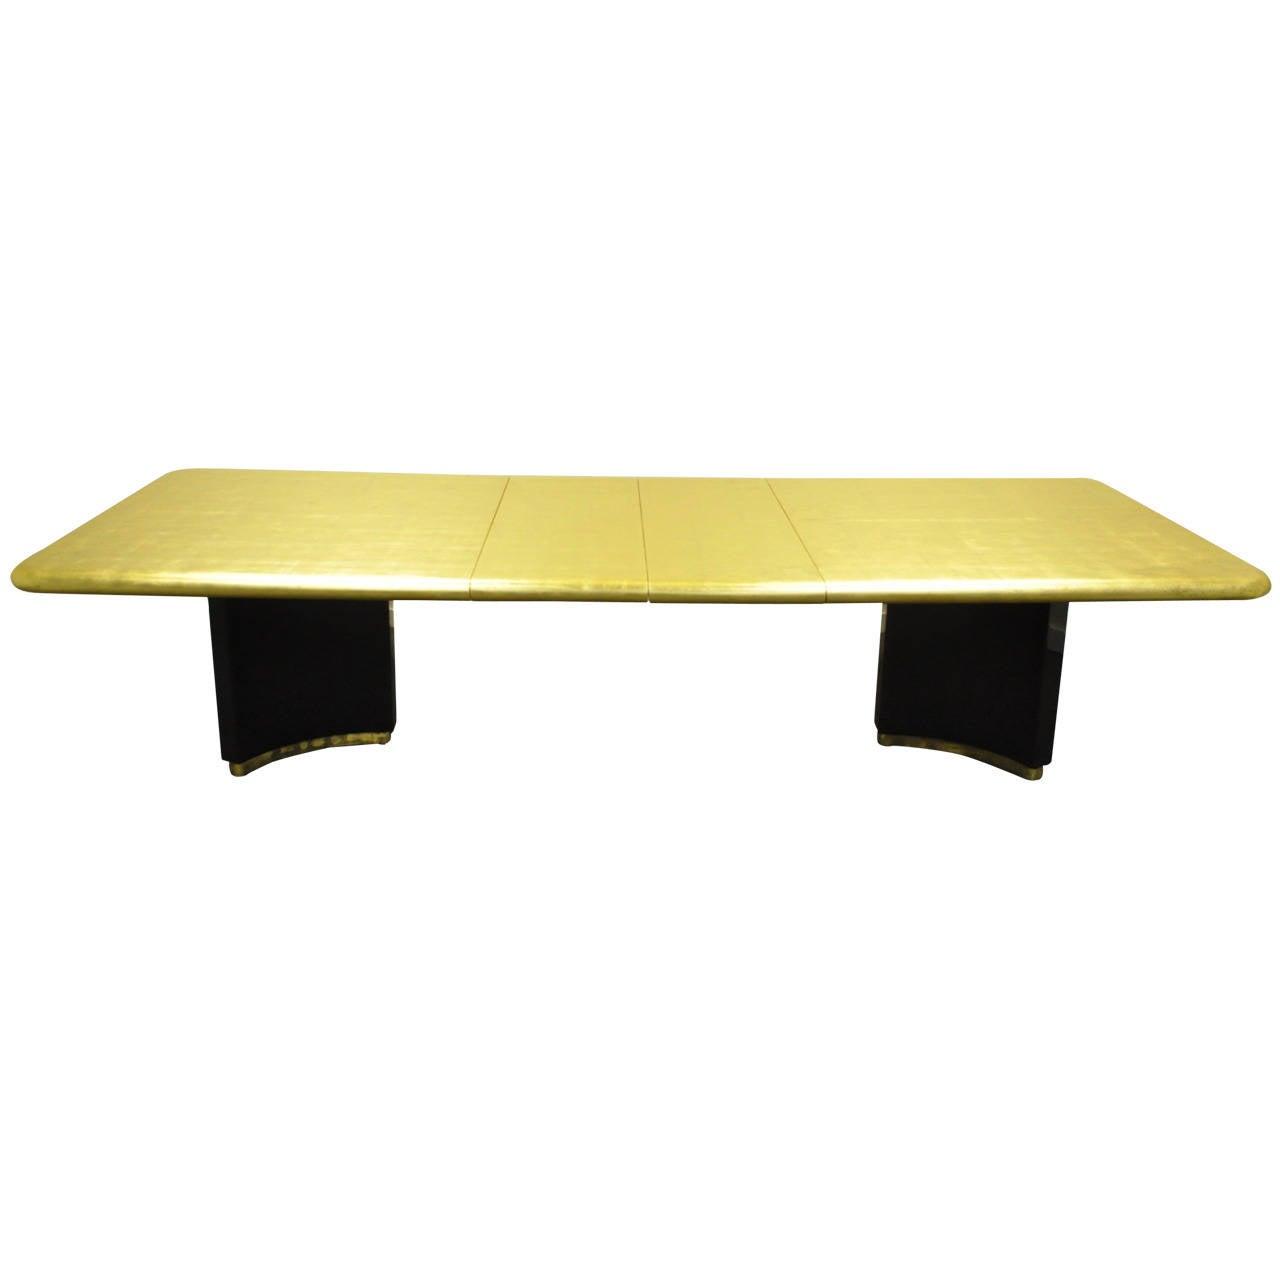 custom gold leaf art deco style extension dining table. Black Bedroom Furniture Sets. Home Design Ideas